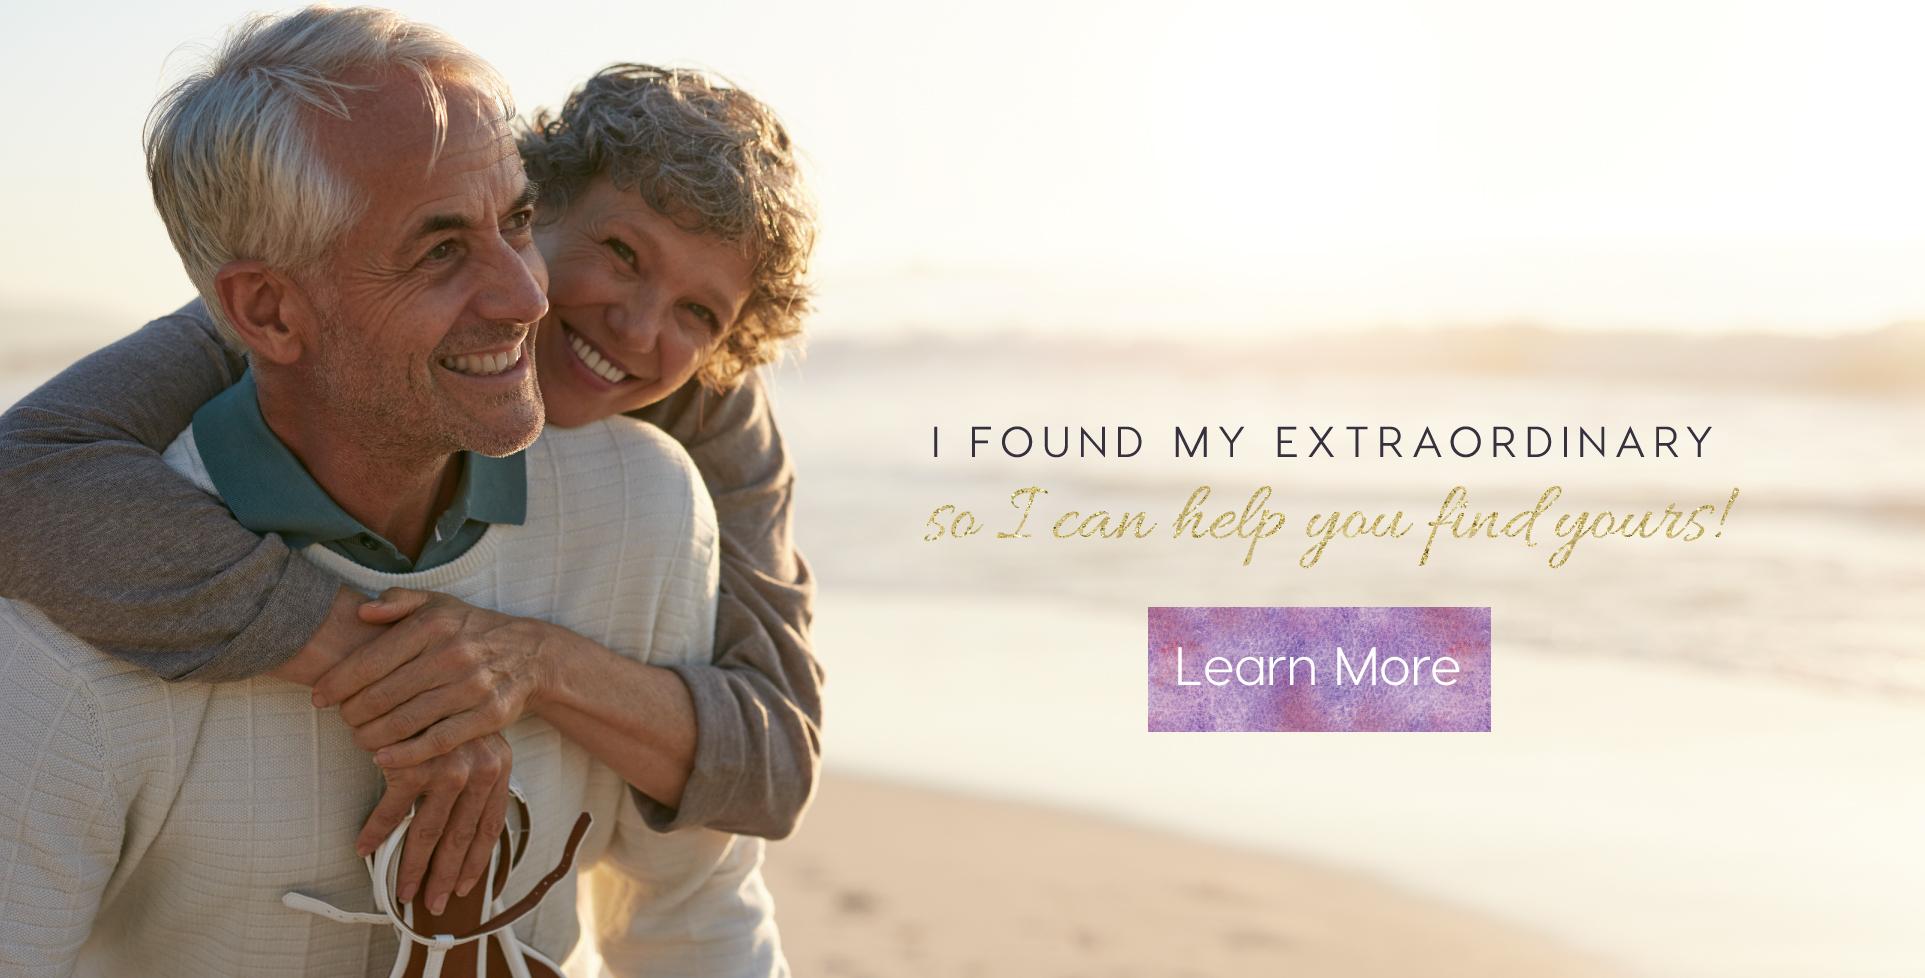 I found my extraordinary with Renewed Living